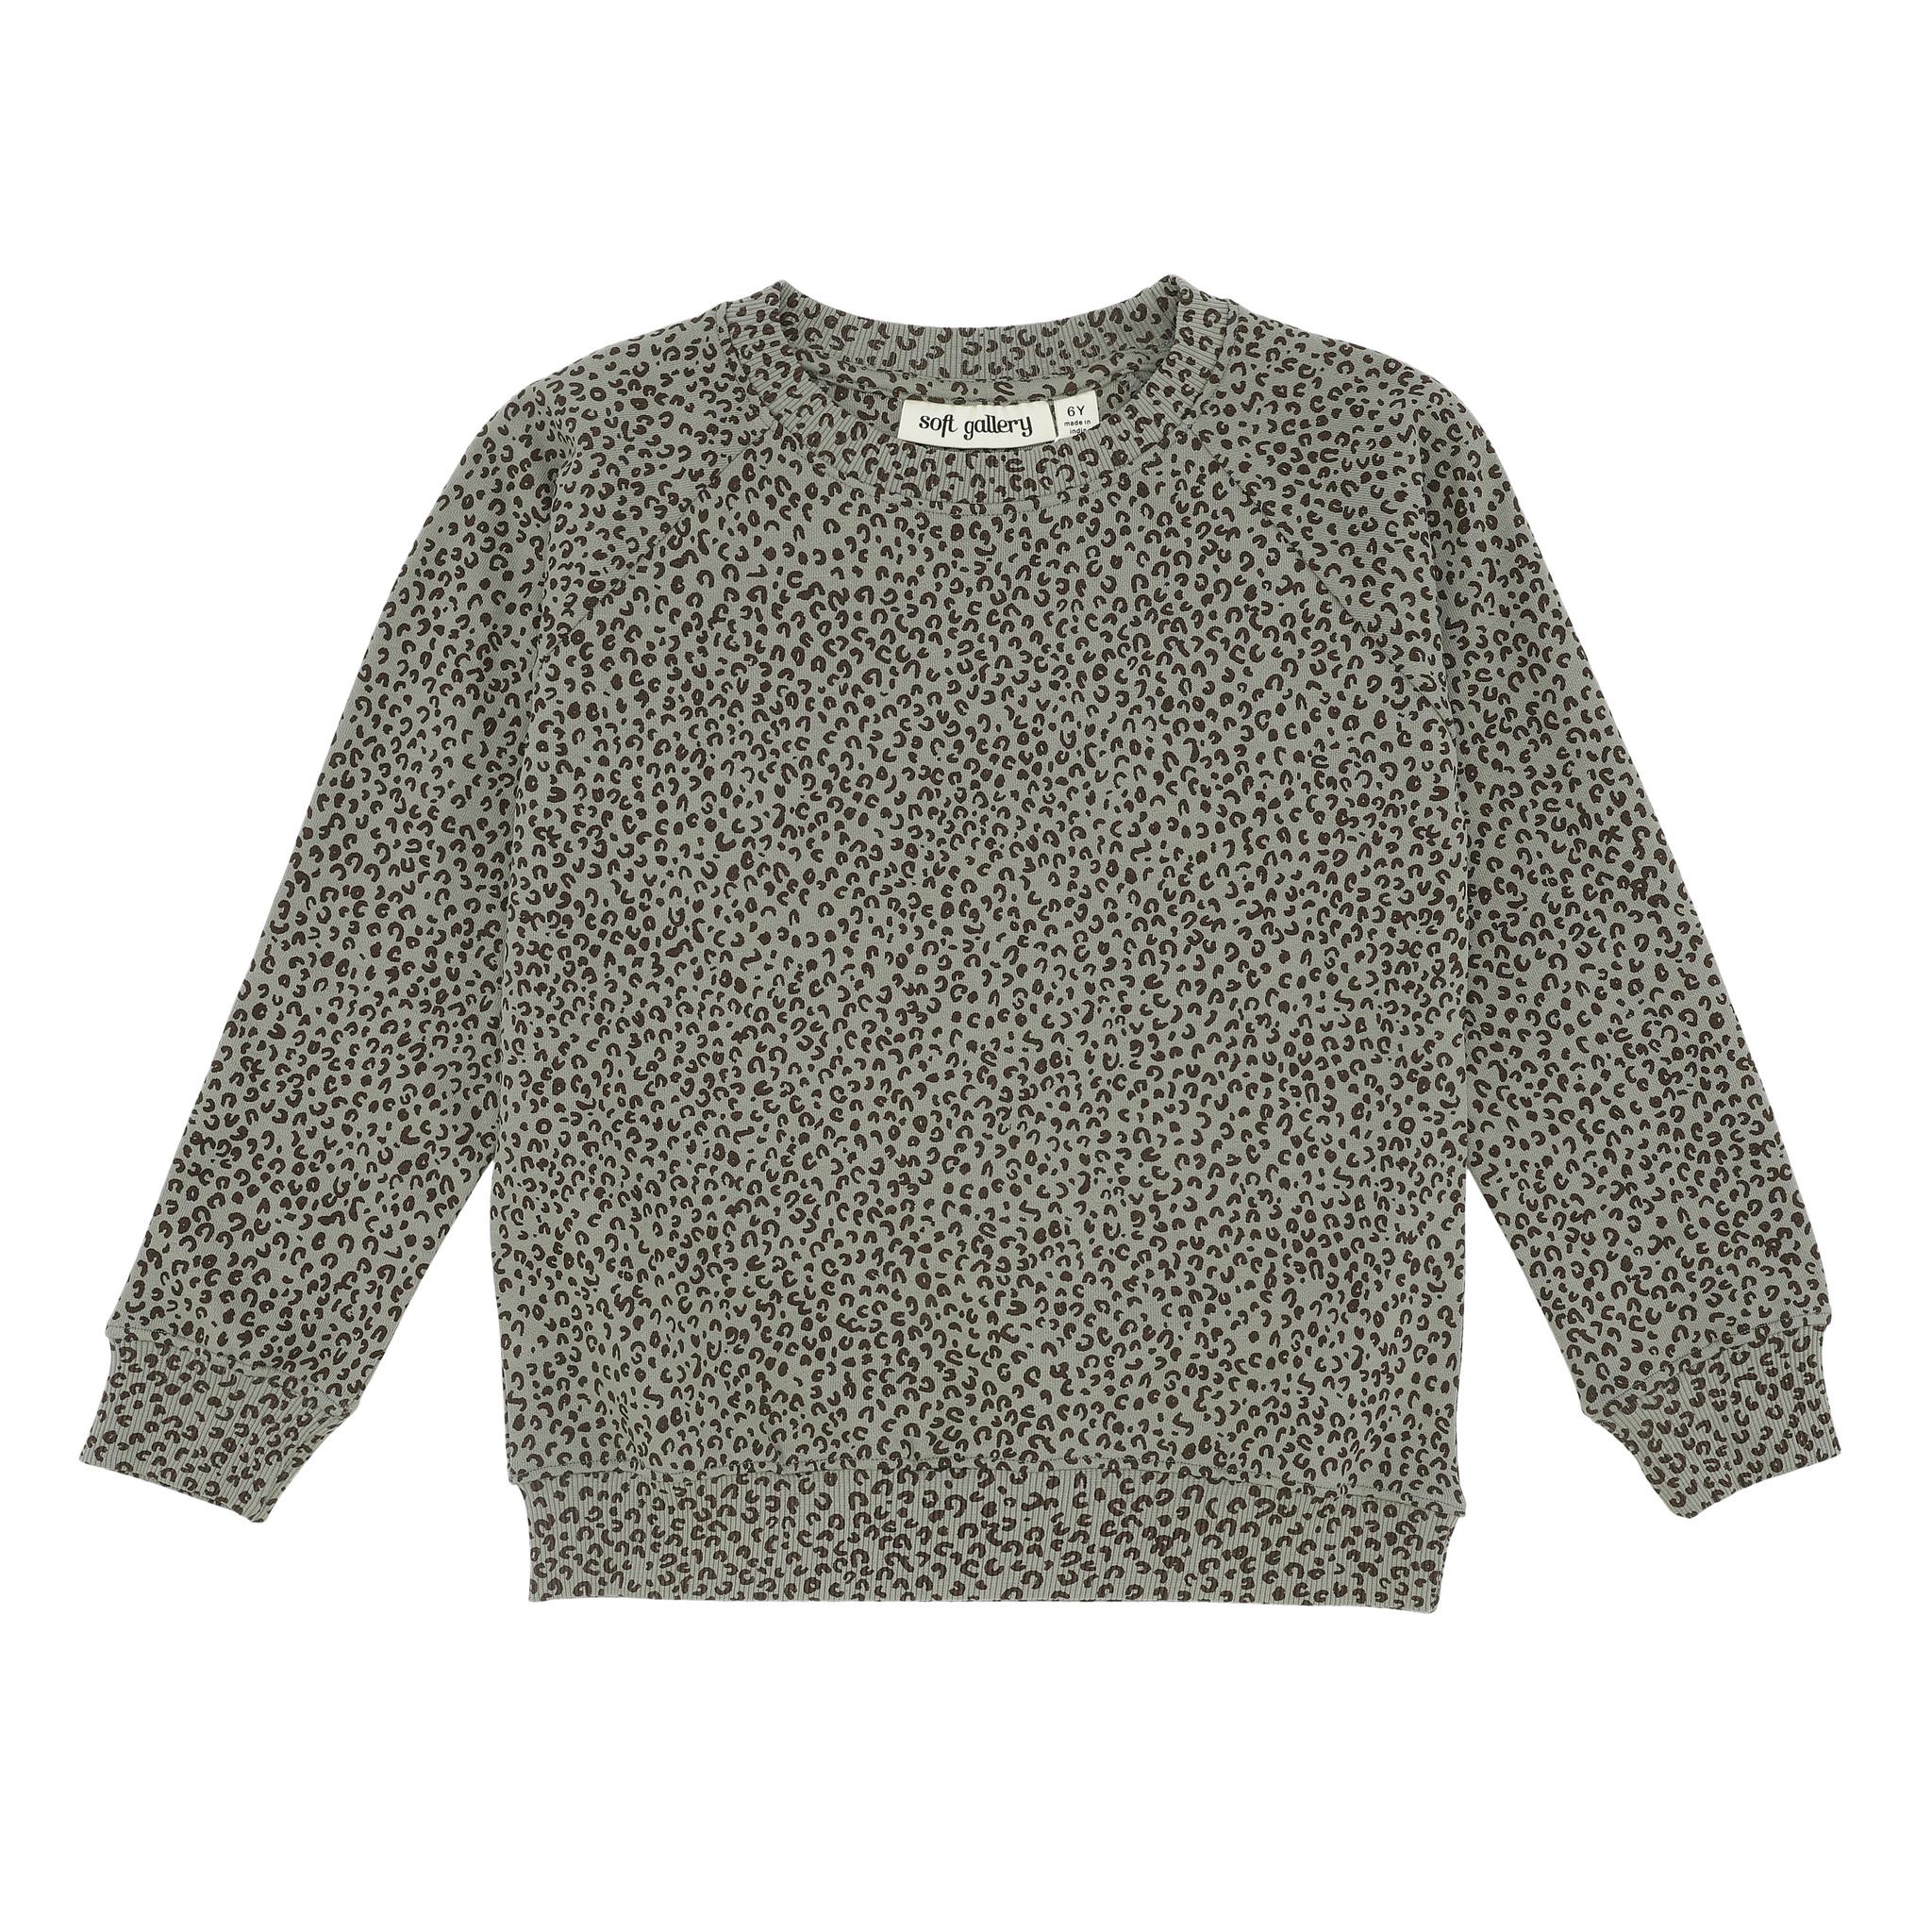 Chaz sweatshirt - Shadow / AOP Leospot-1